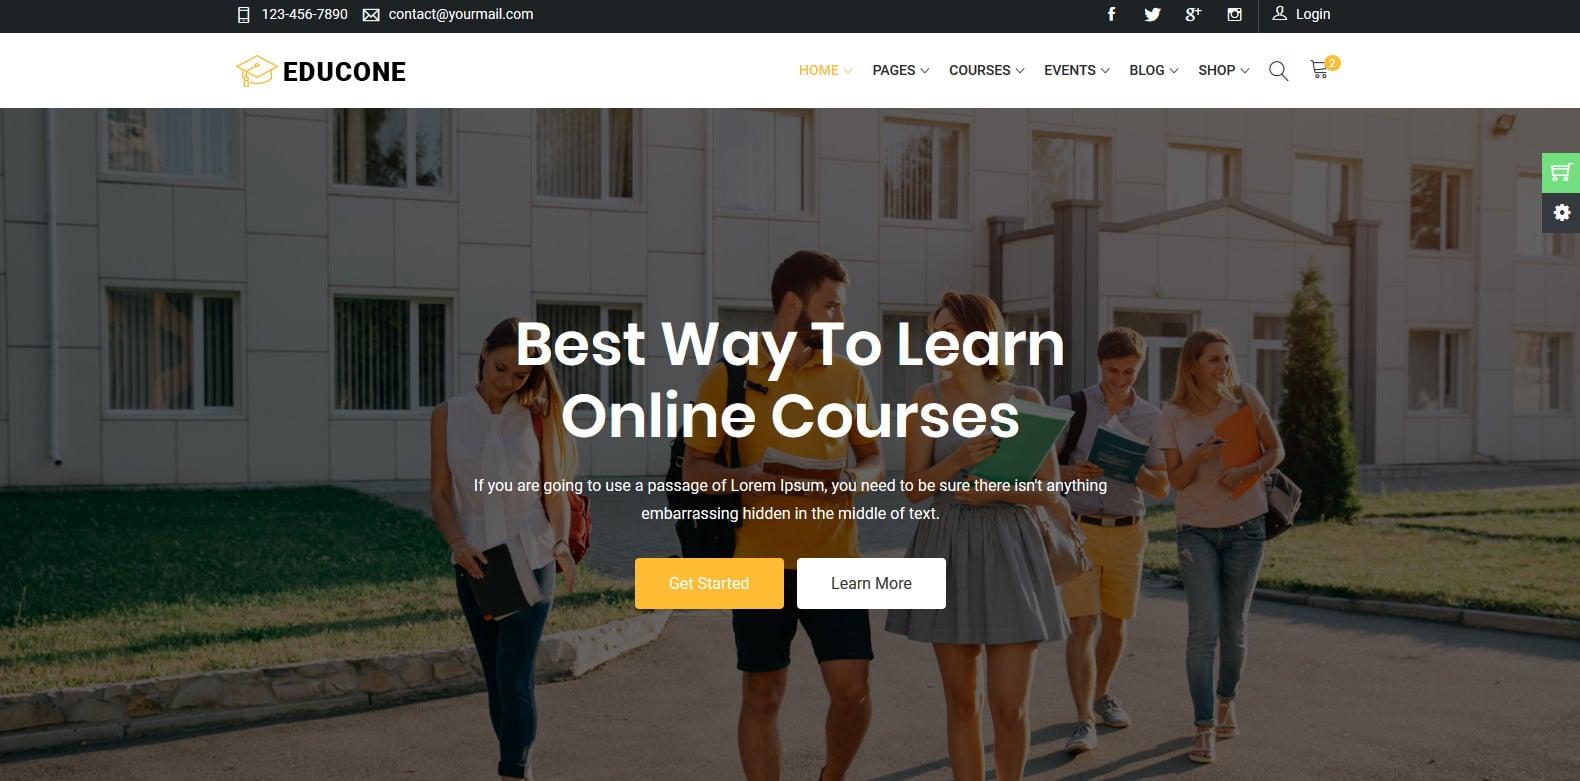 educone-education-website-template